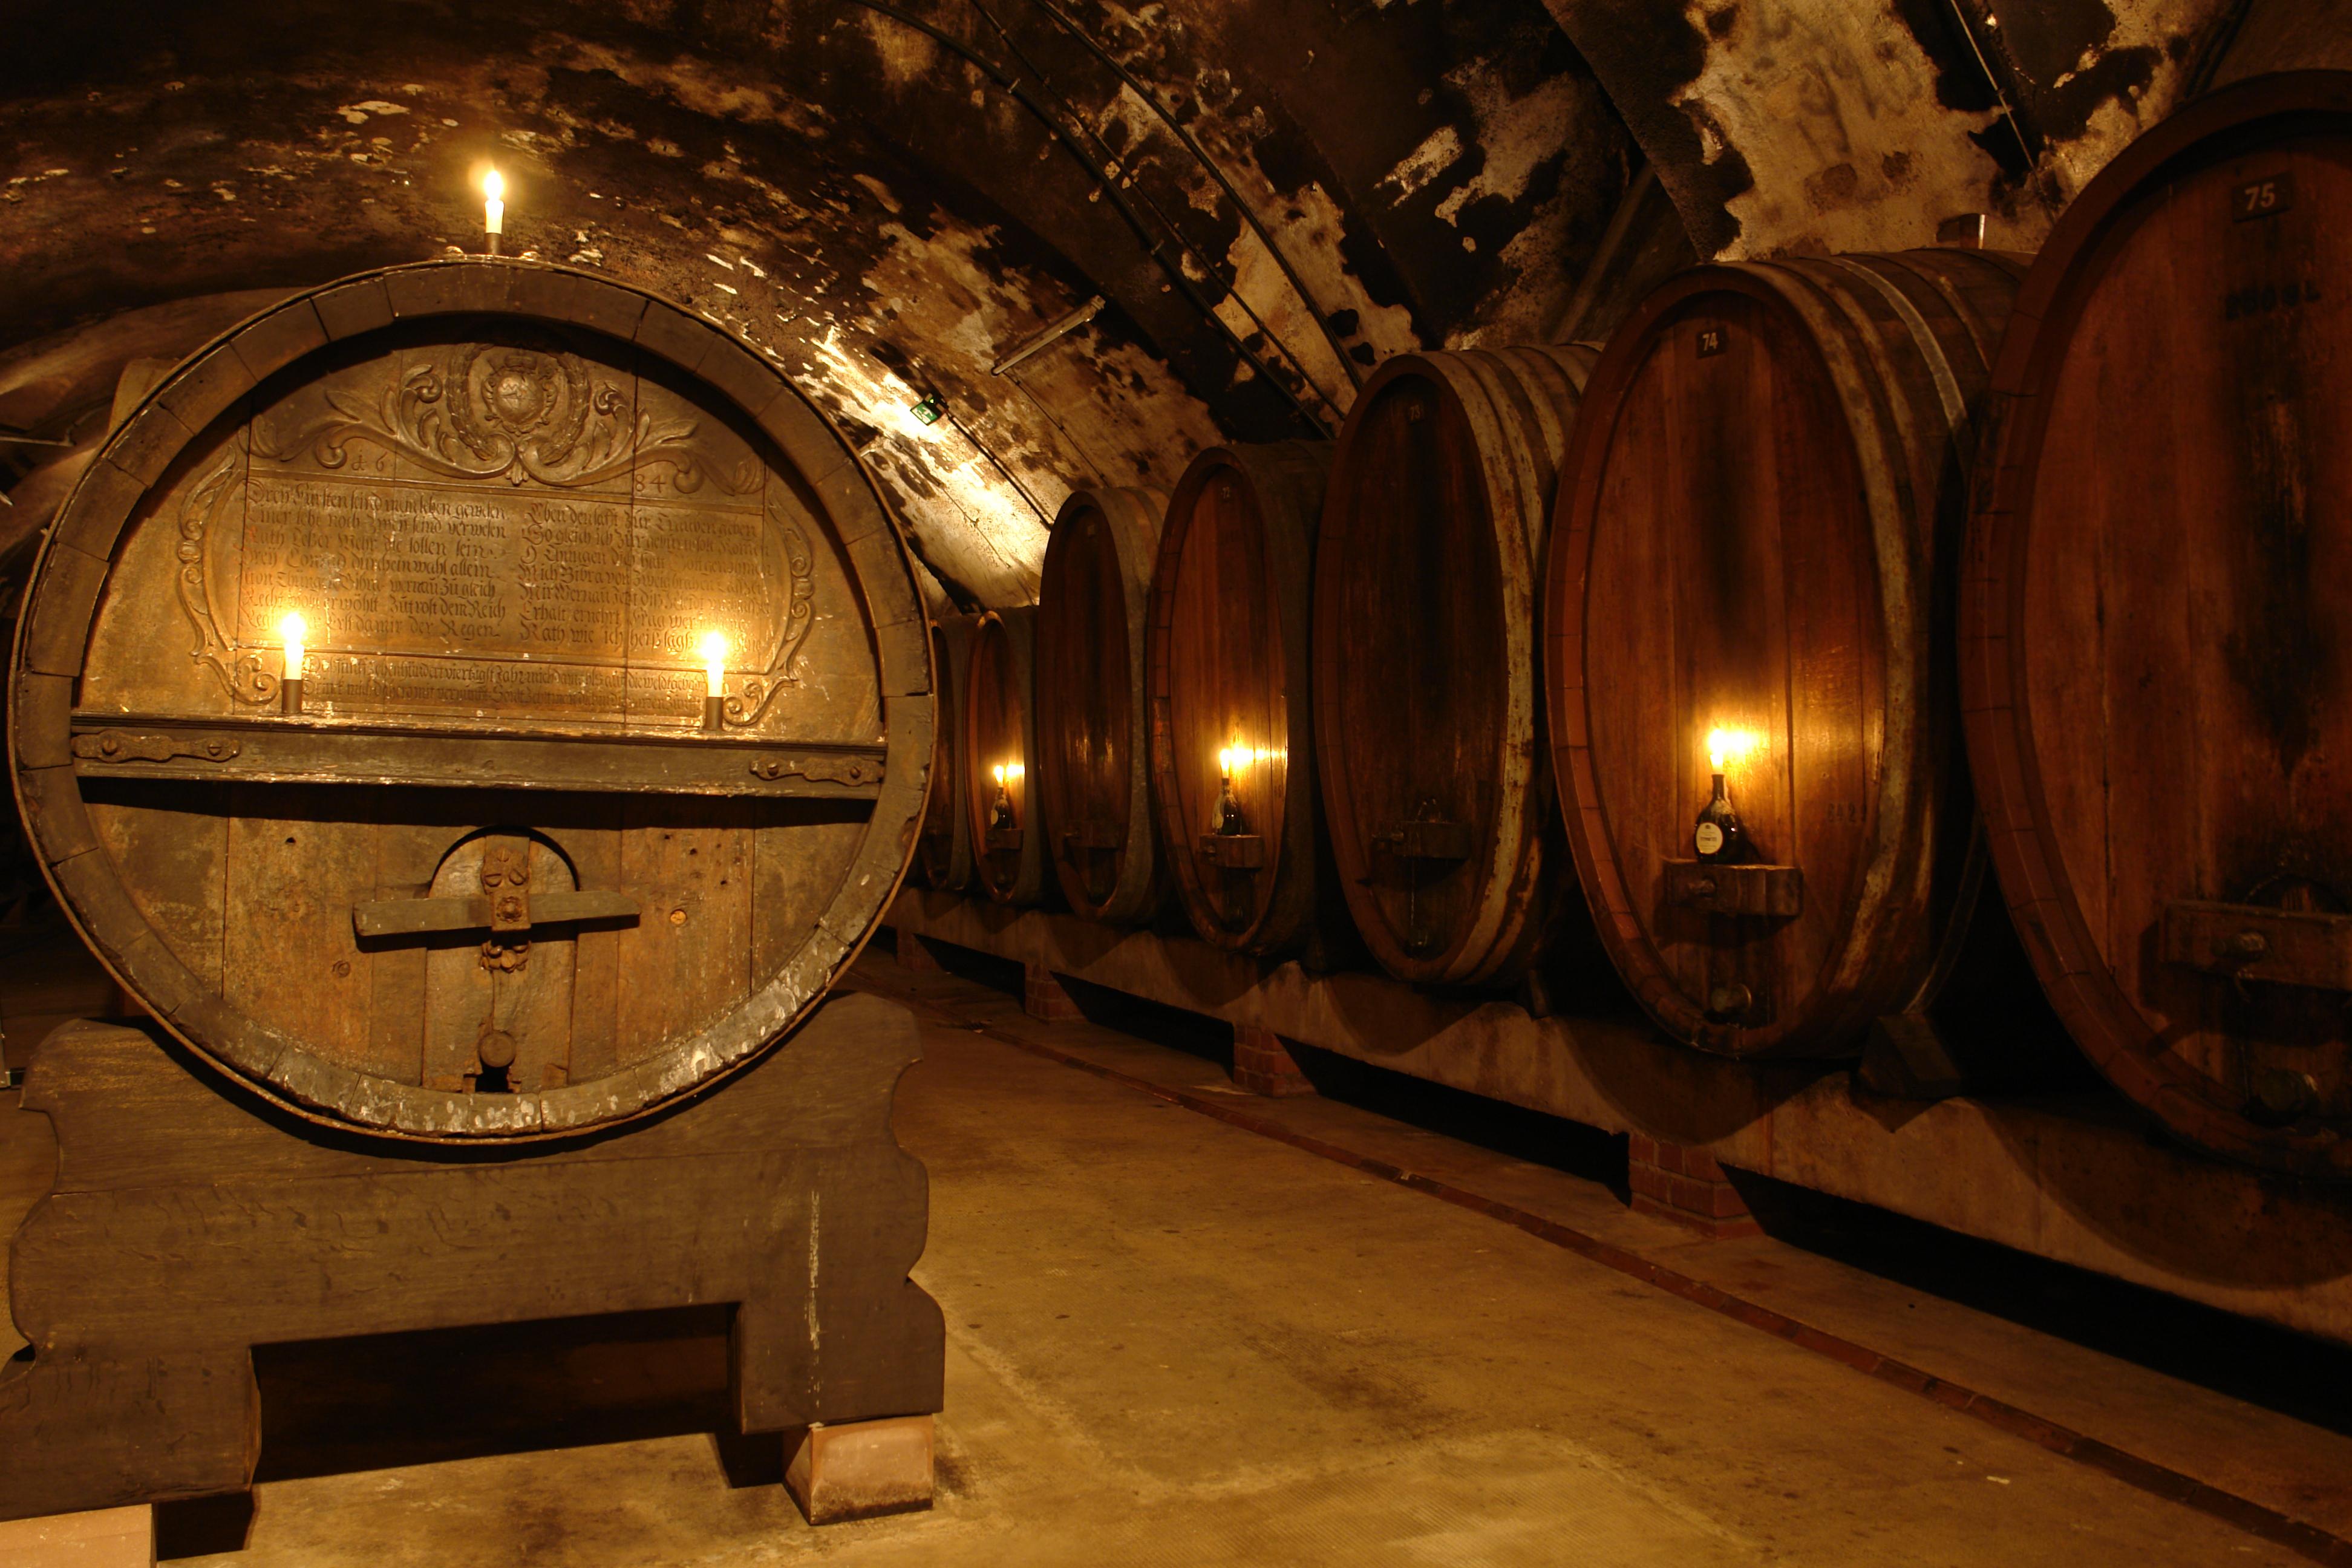 File:Residence Würzburg - Wine cellar 2.JPG - Wikimedia ...